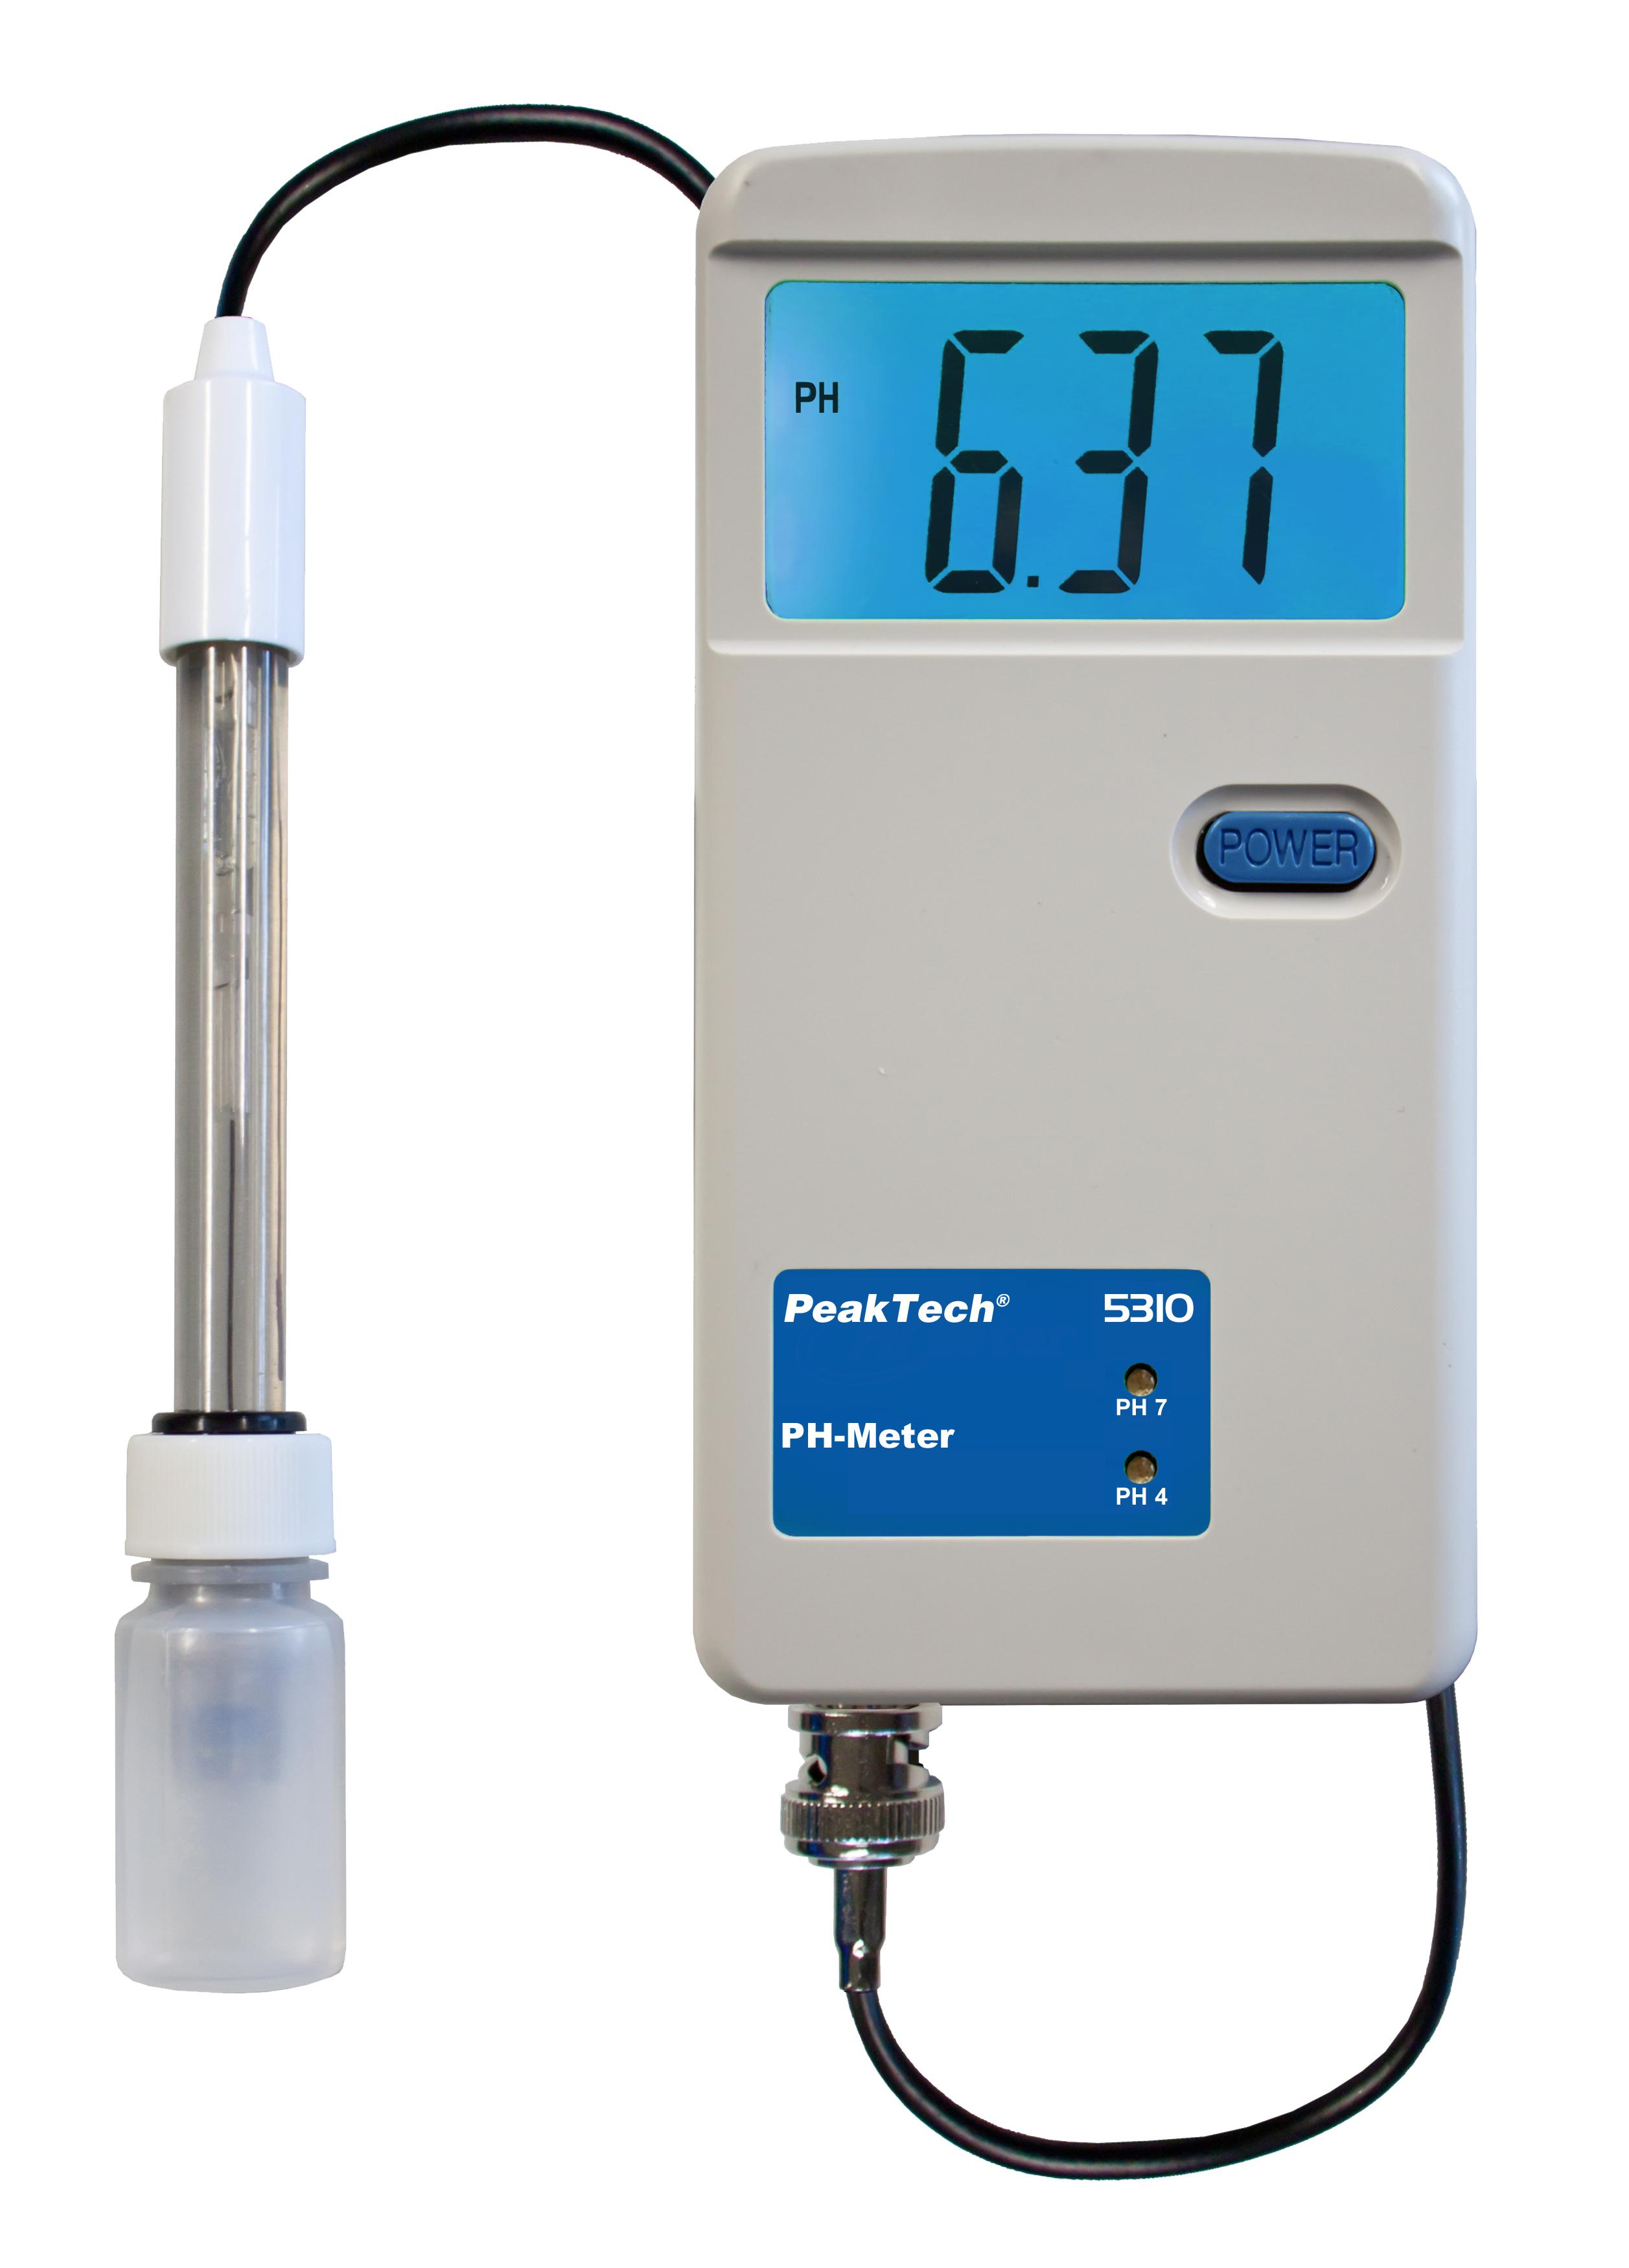 «PeakTech® P 5310» PH Meter / Water Quality Tester